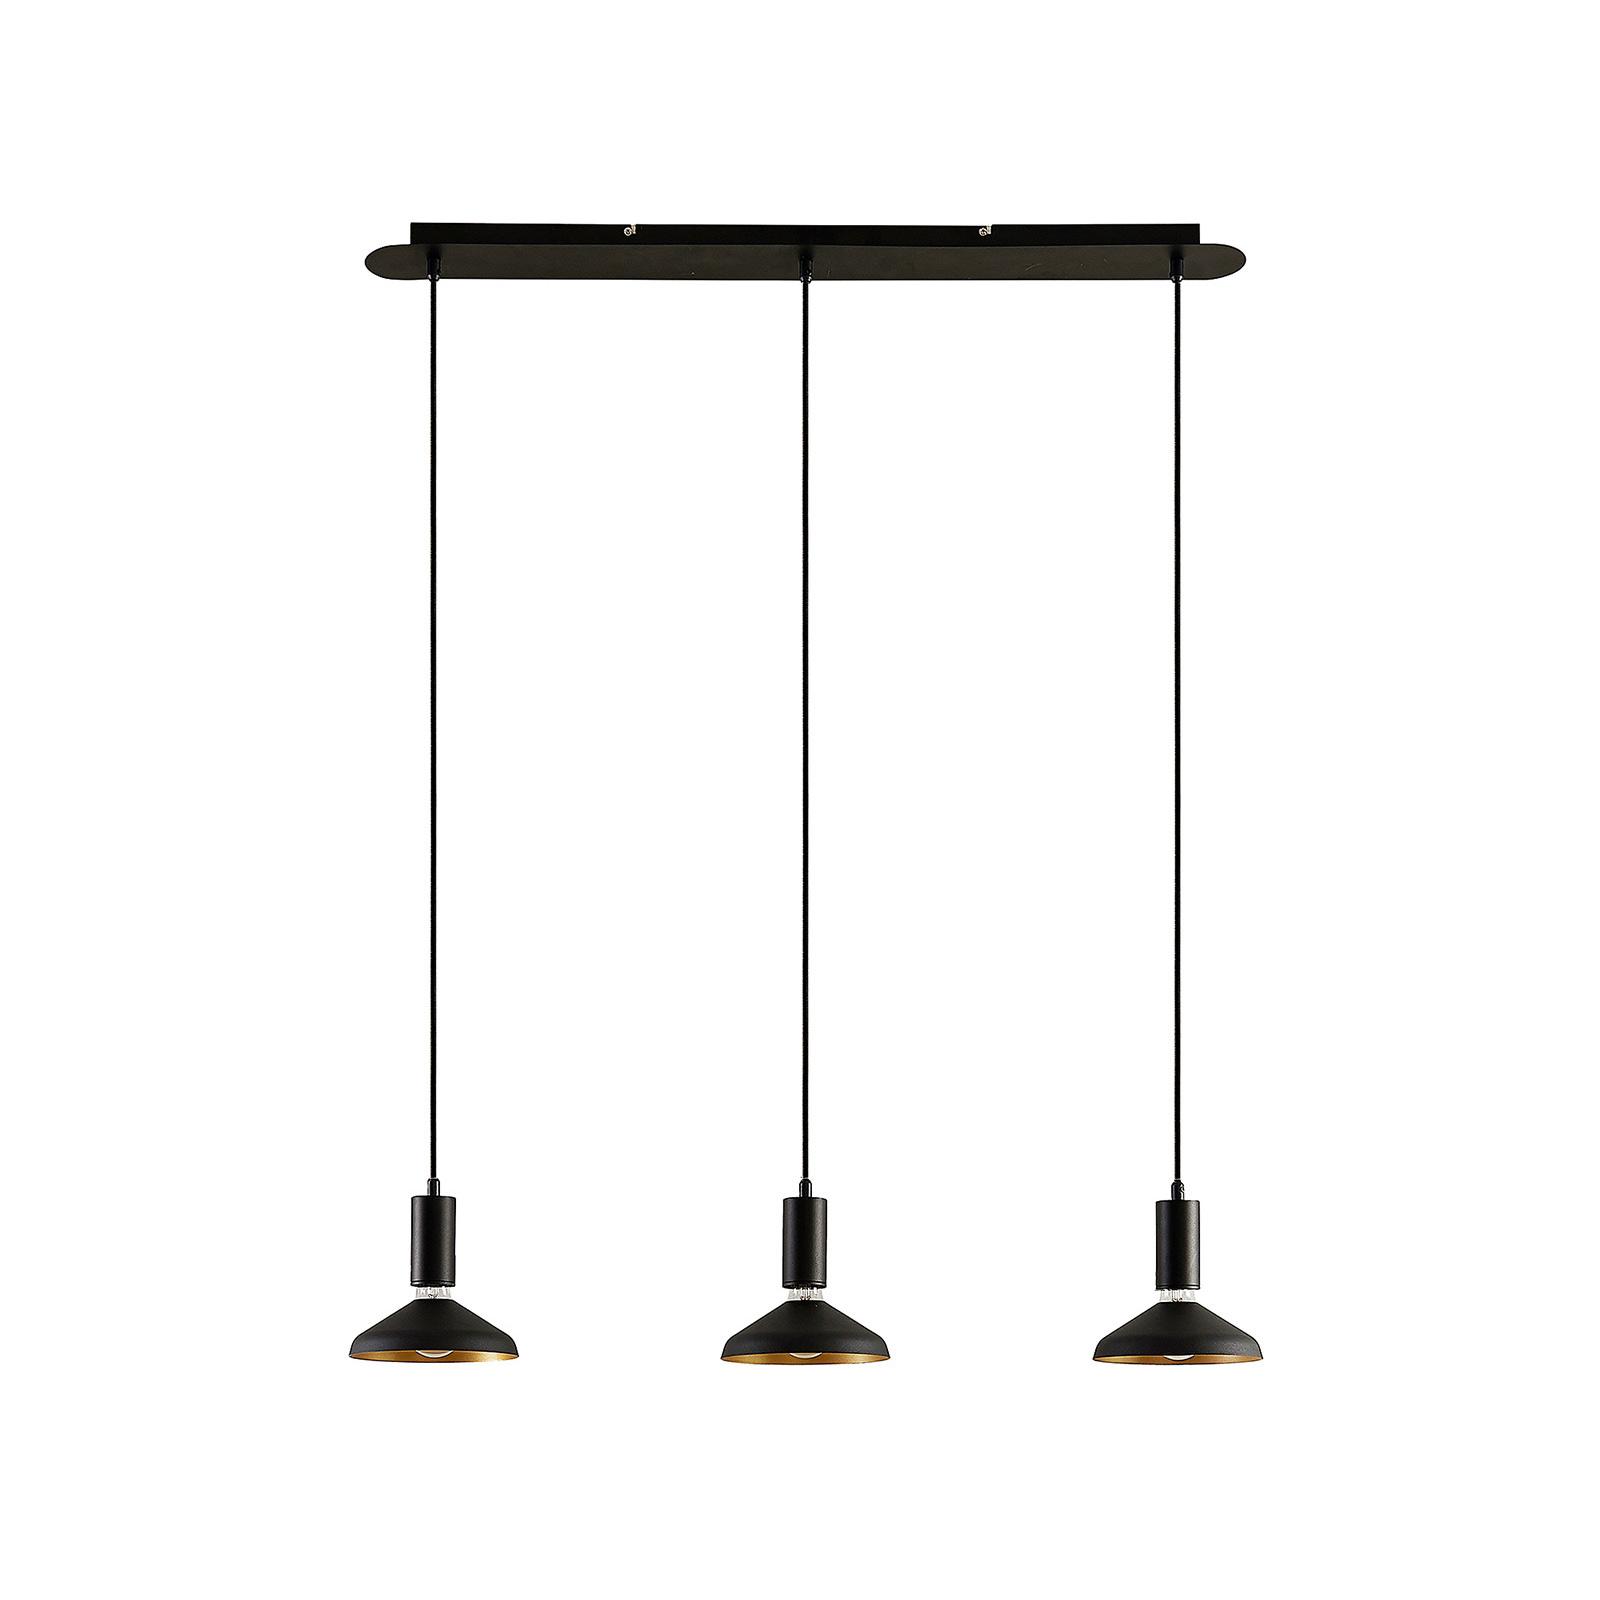 Arcchio Jaika pendellampa, 3 lampor, svart   Lamp24.se